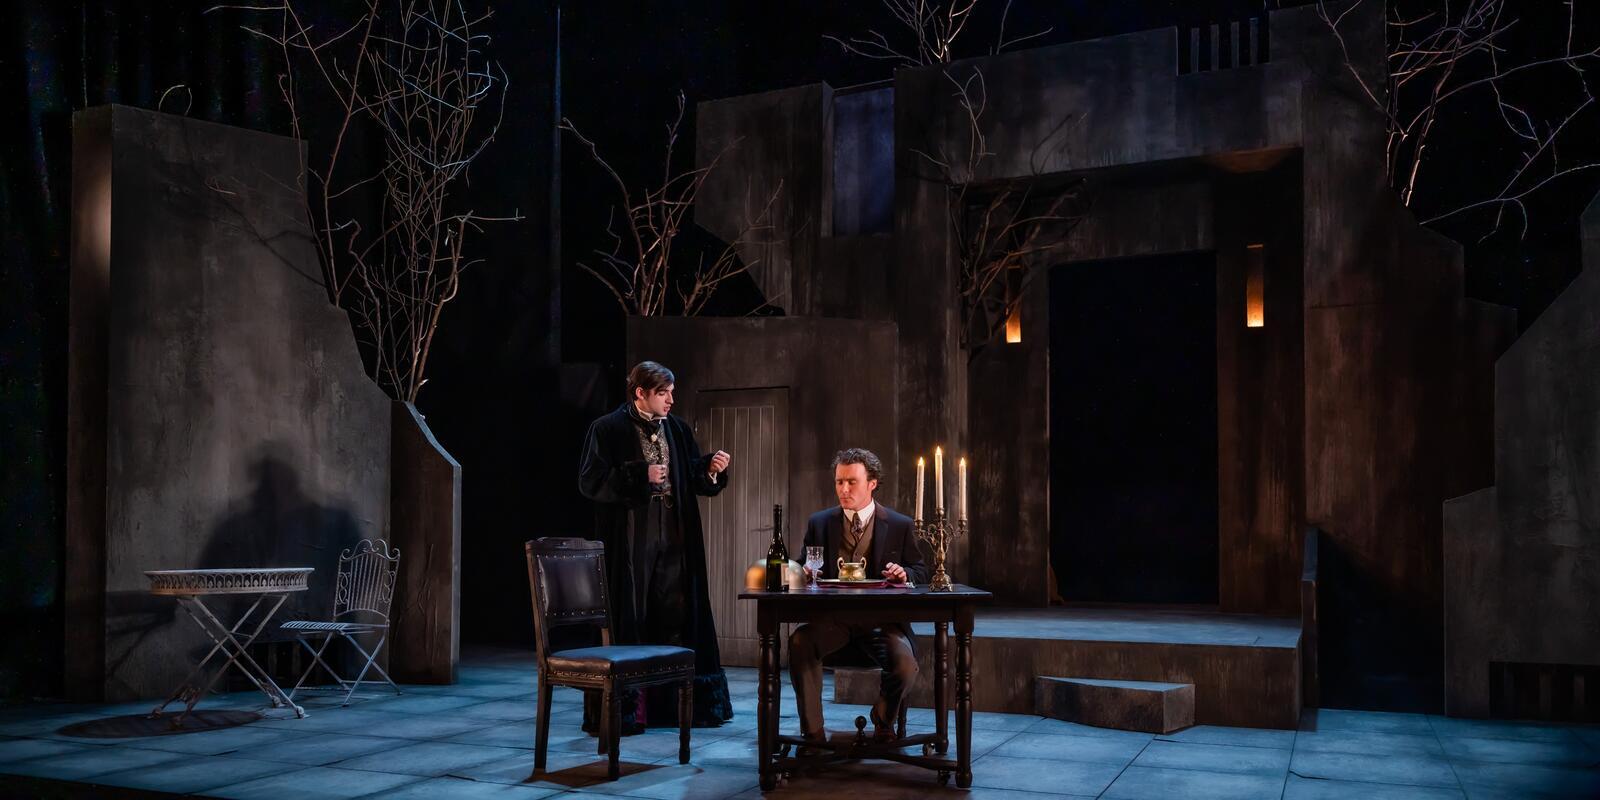 Photograph from Dracula - lighting design by James McFetridge